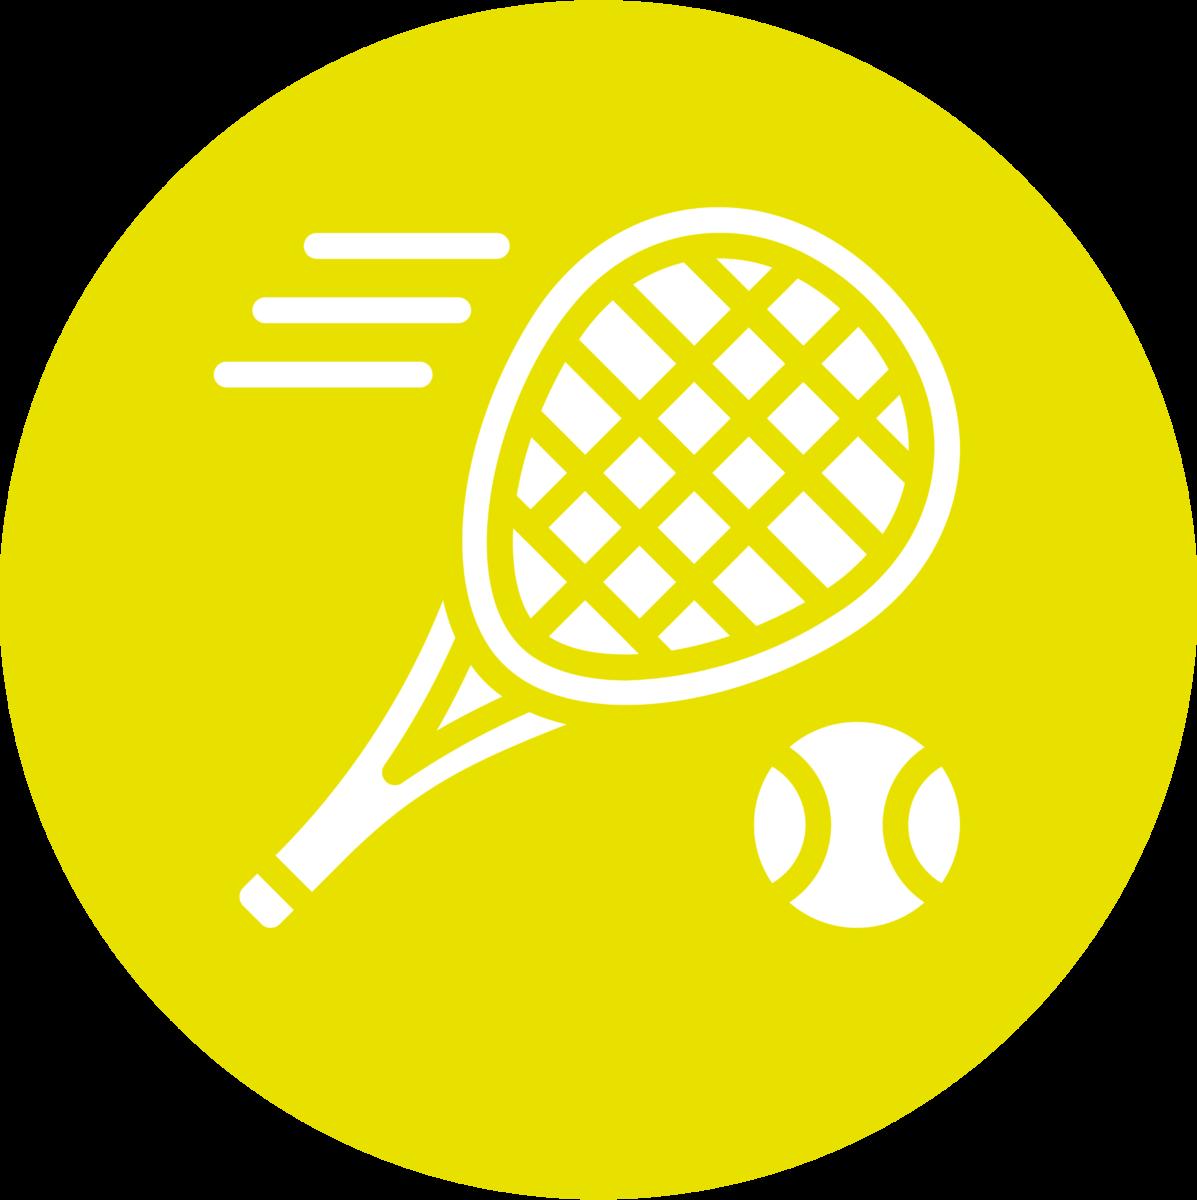 Tennishalle Icon